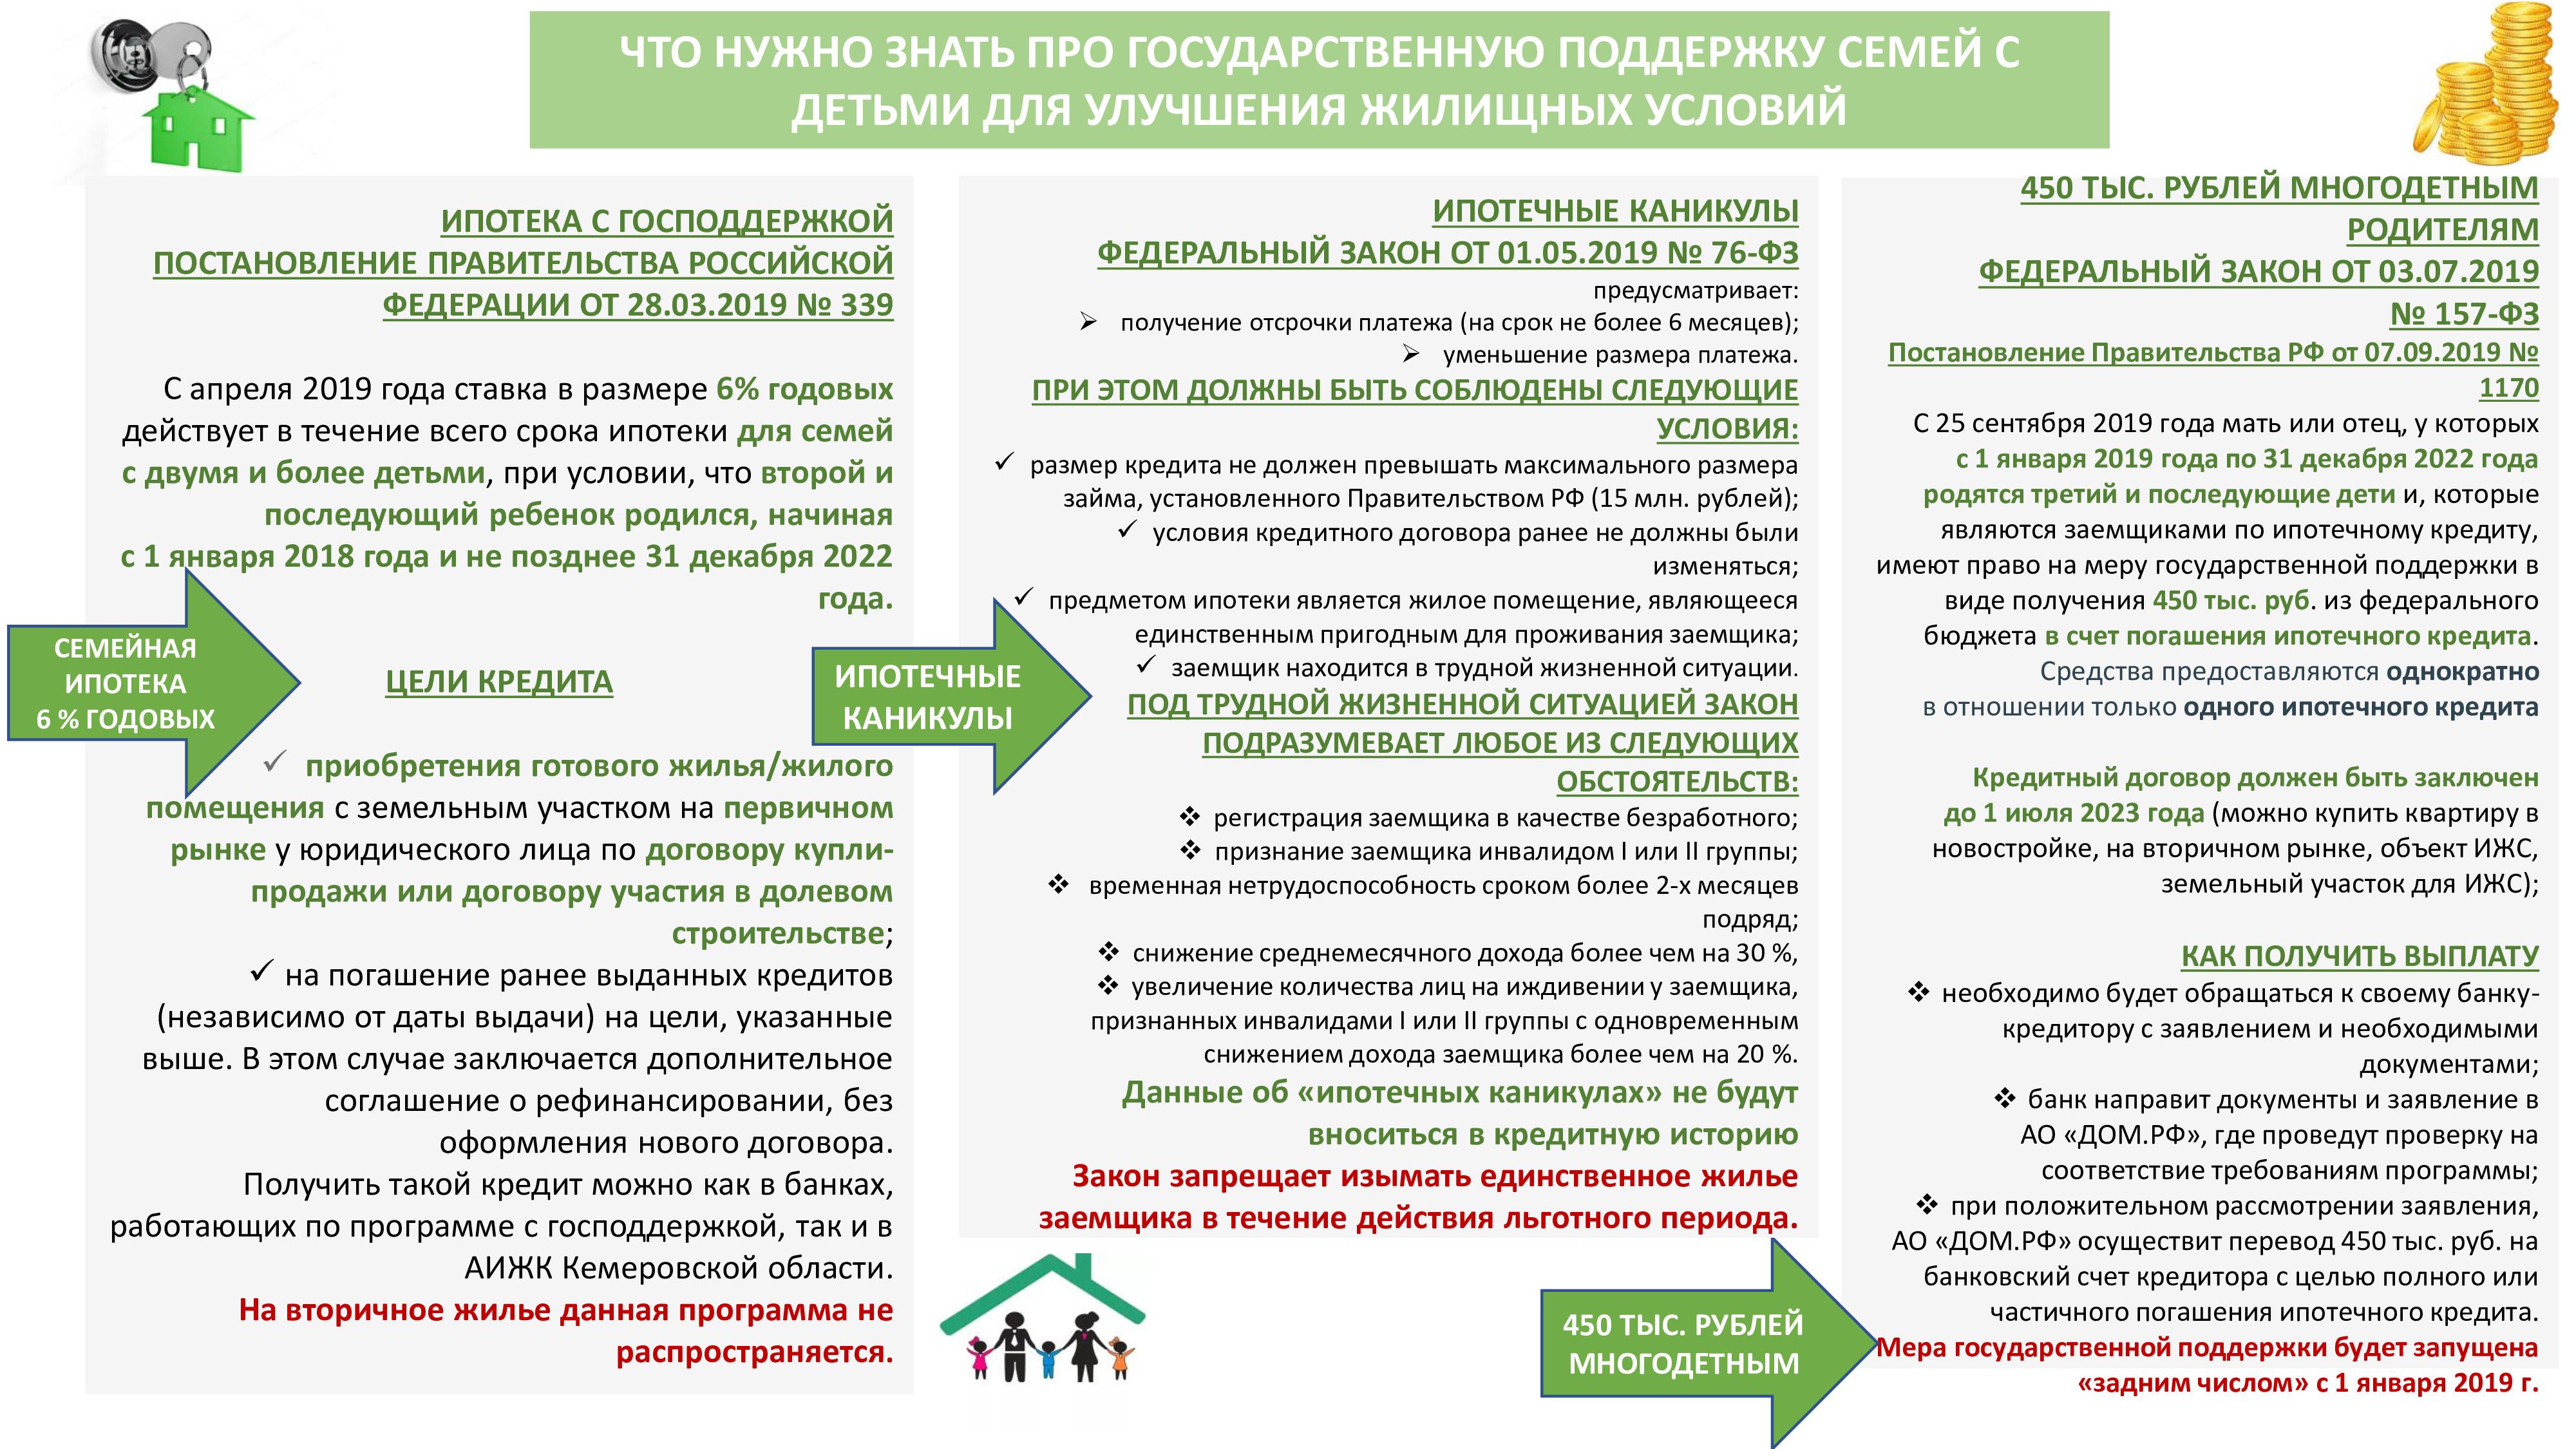 Памятка по ипотеке общая (pdf.io)